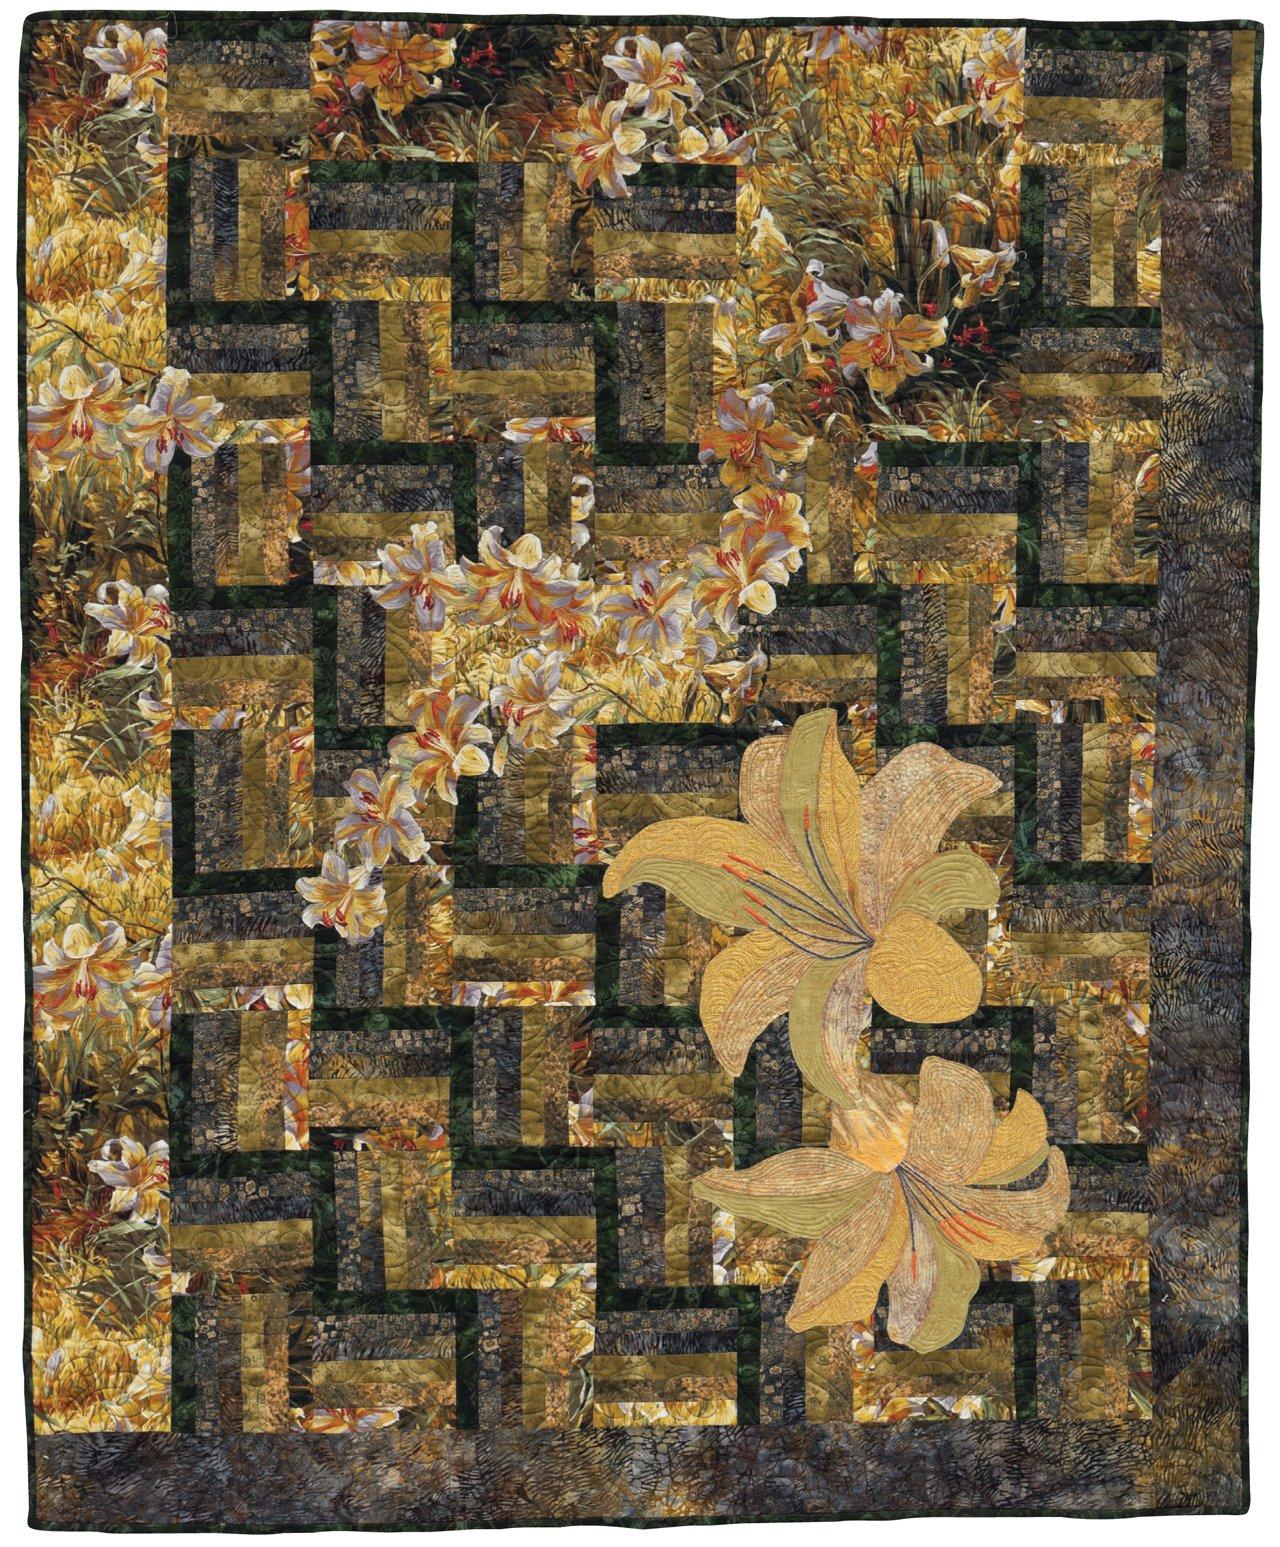 Big Print Patchwork Quilt Patterns For Large Scale Prints Sandy